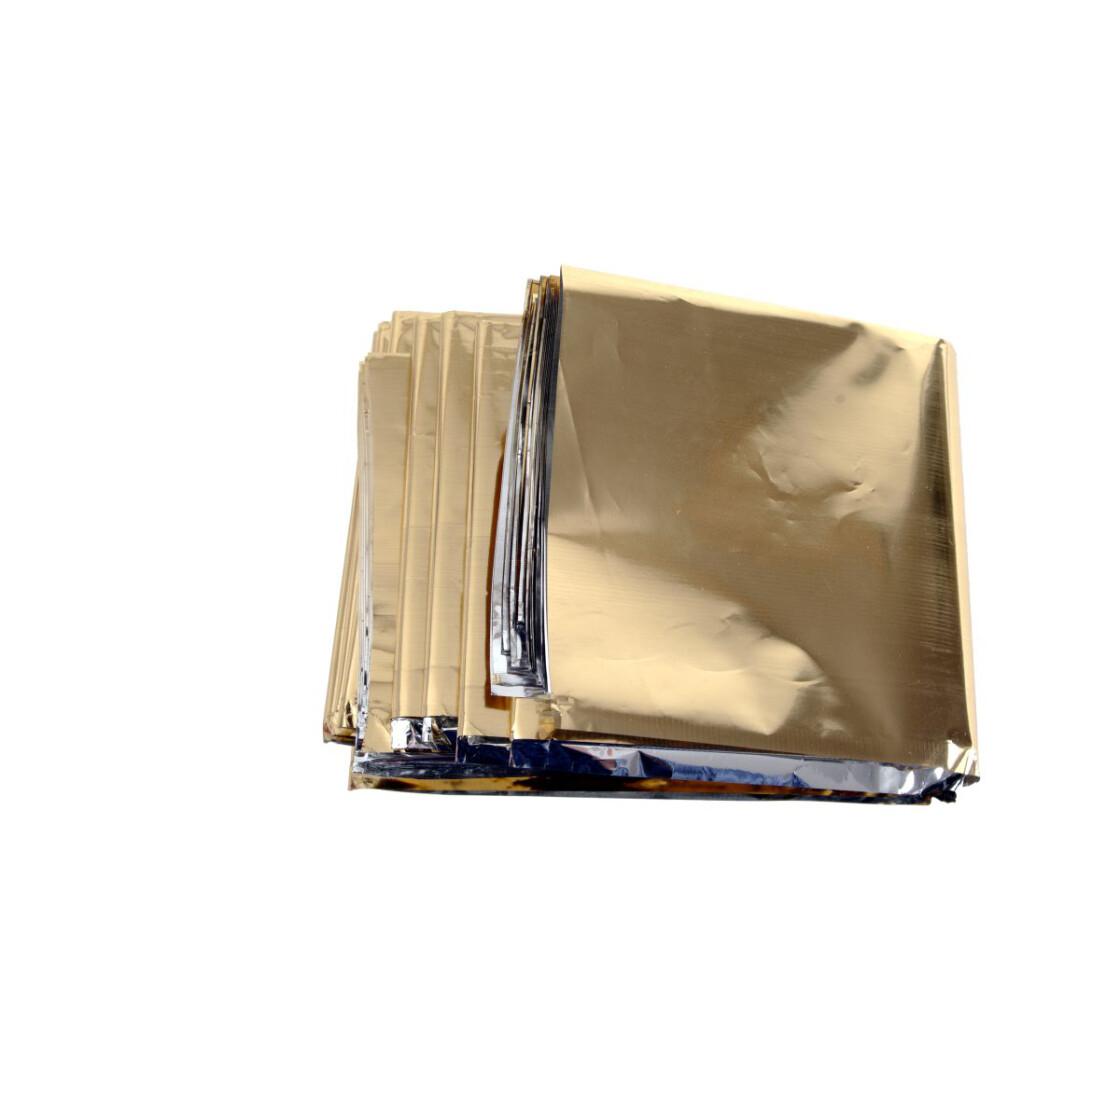 relags 39 gold silber 39 rettungsdecke outdoor ausr stung. Black Bedroom Furniture Sets. Home Design Ideas